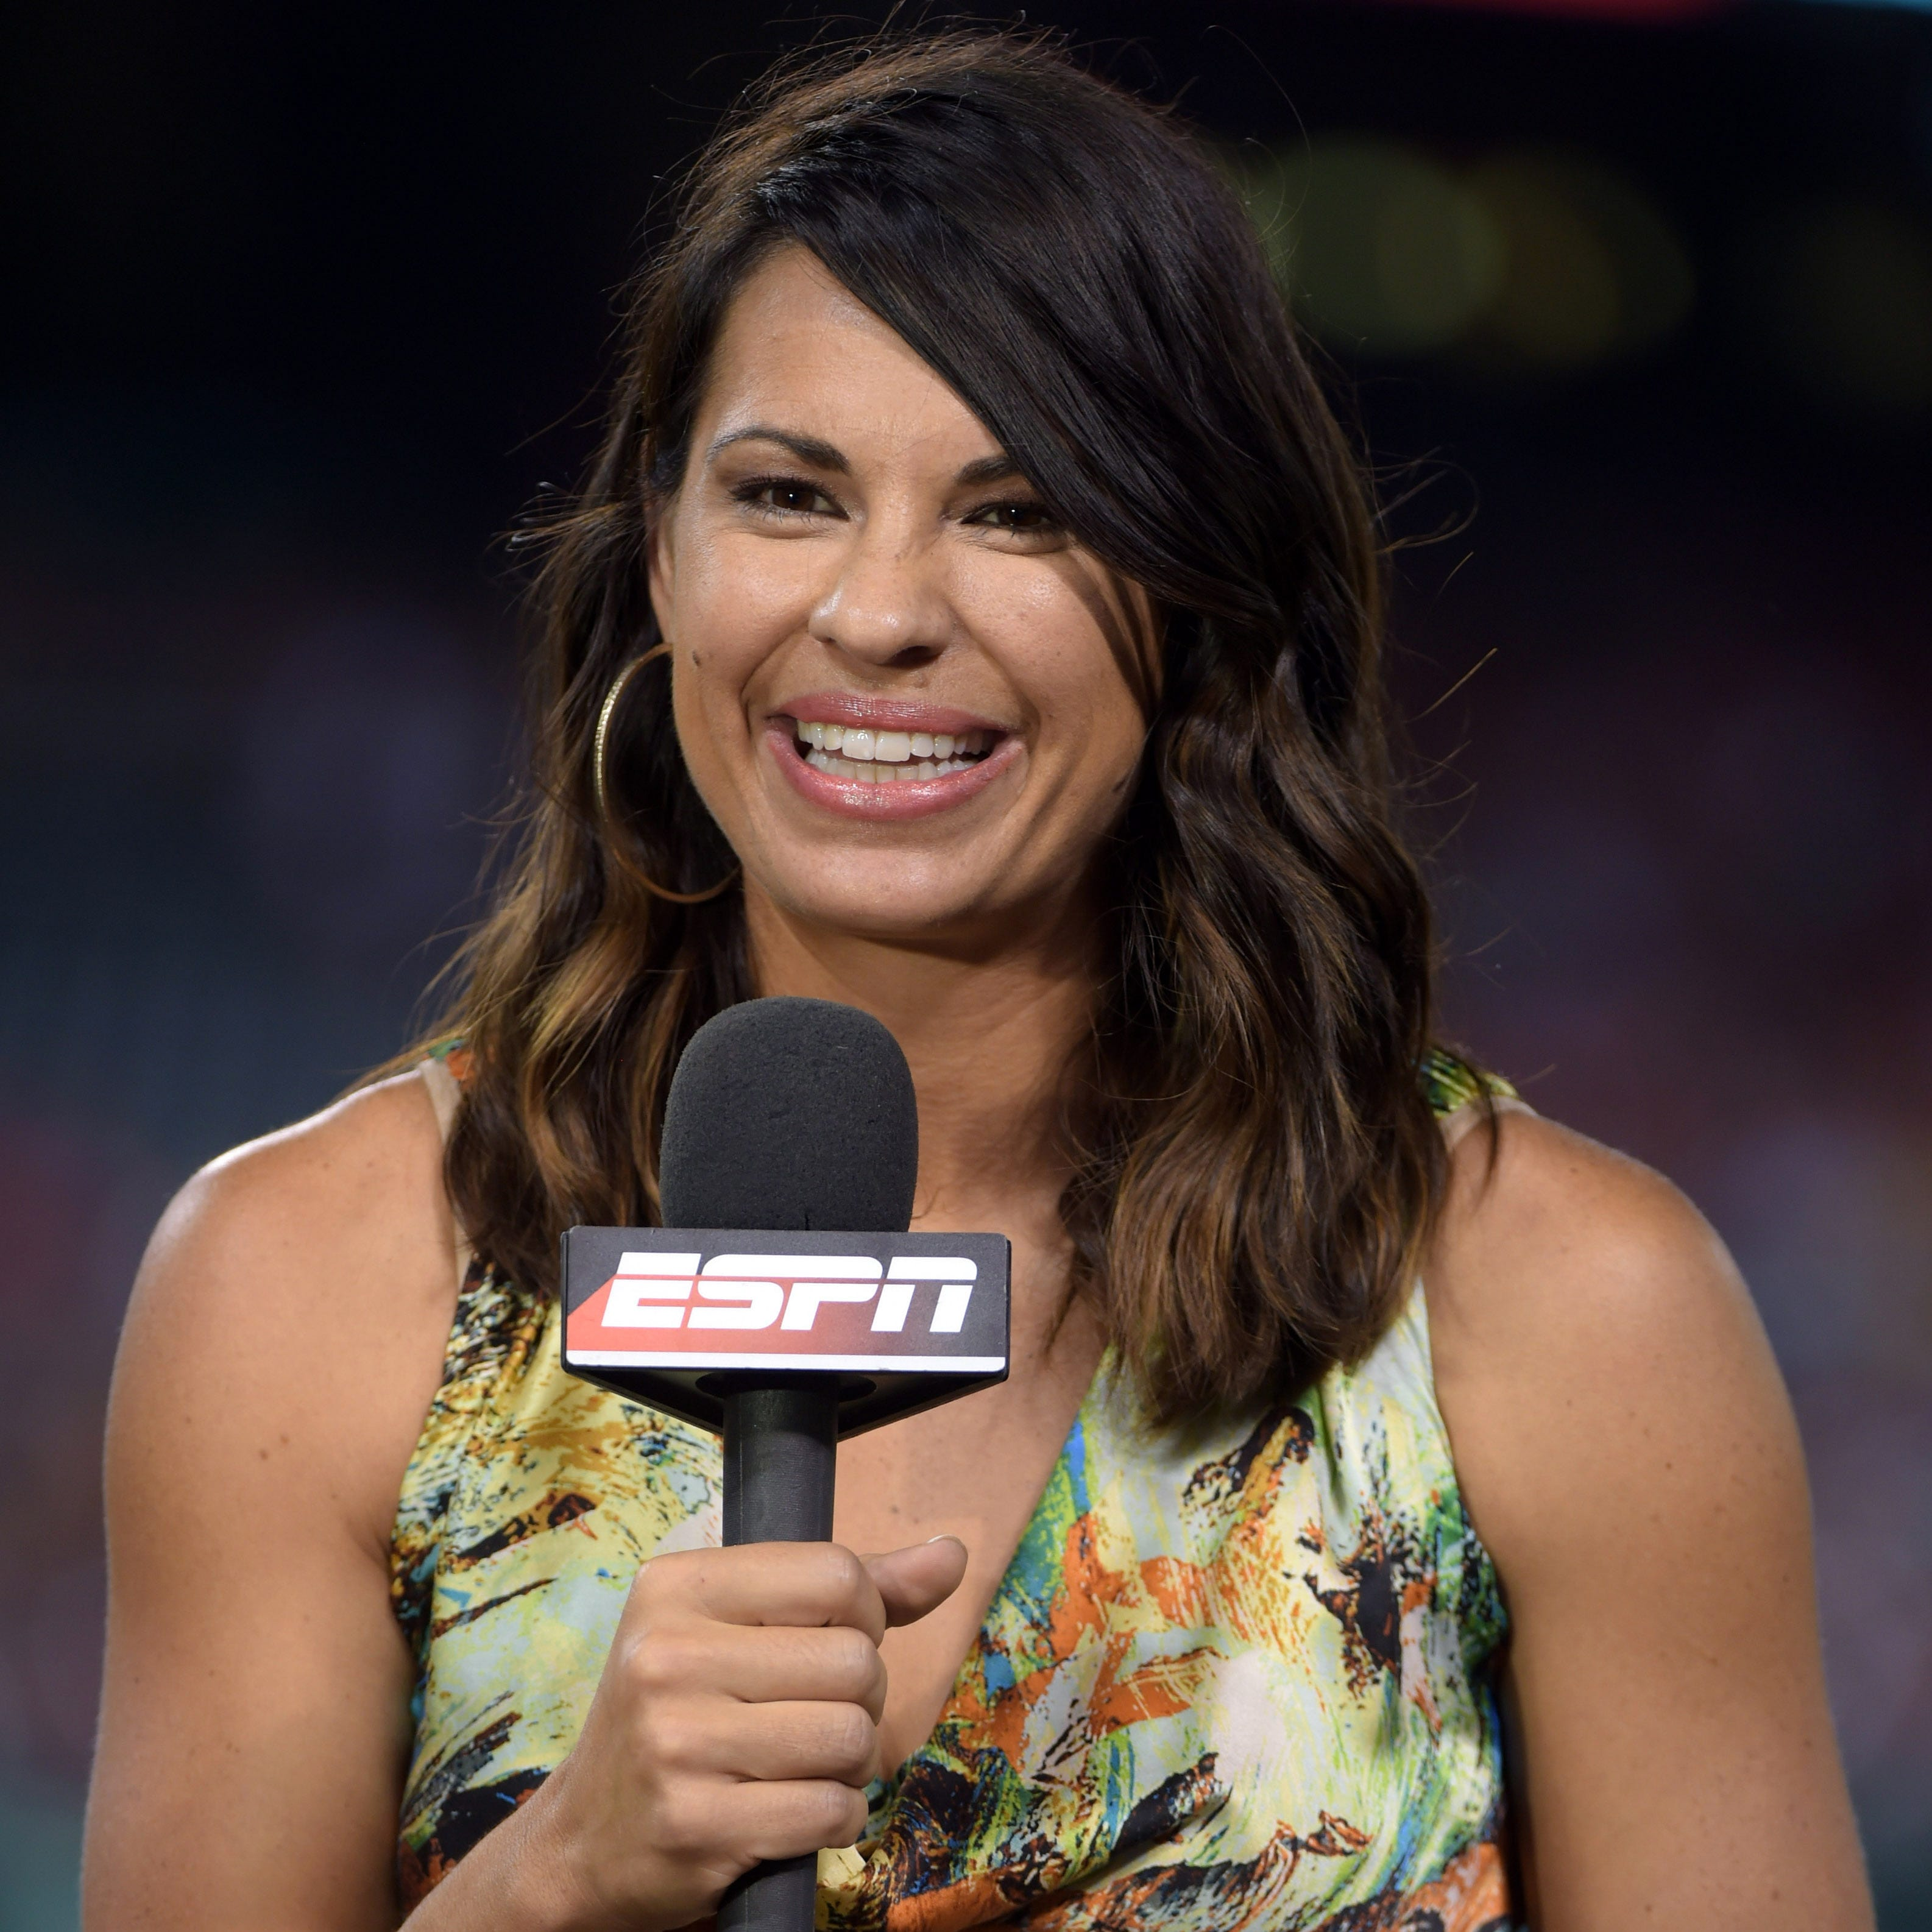 Camarillo High graduate Jessica Mendoza hired as Mets adviser but keeps ESPN job